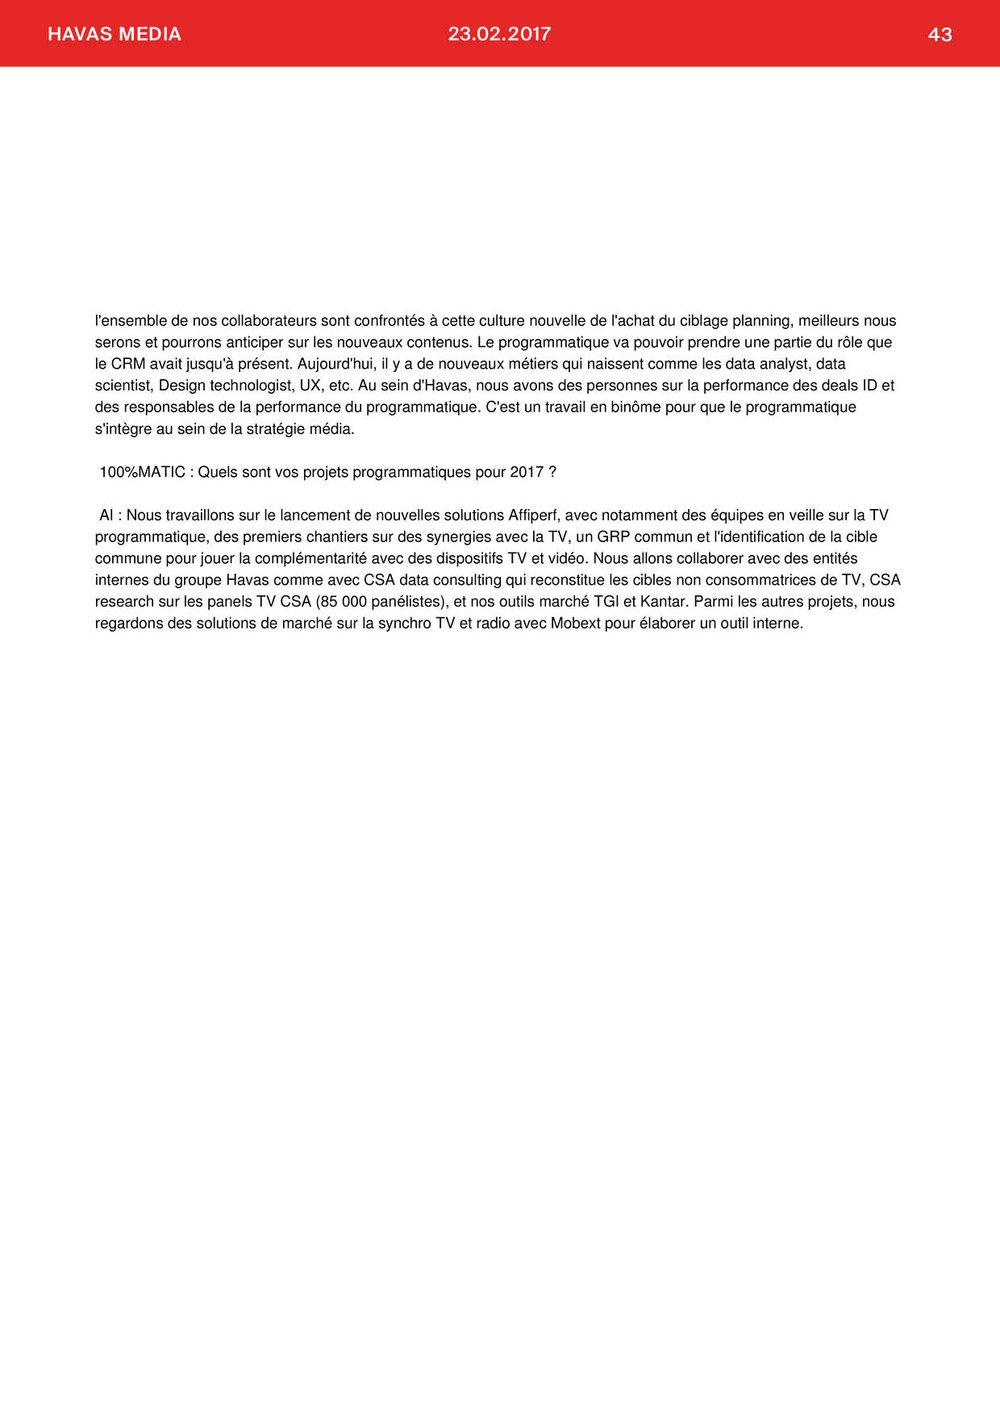 BOOKMEDIA_FEV43.jpg